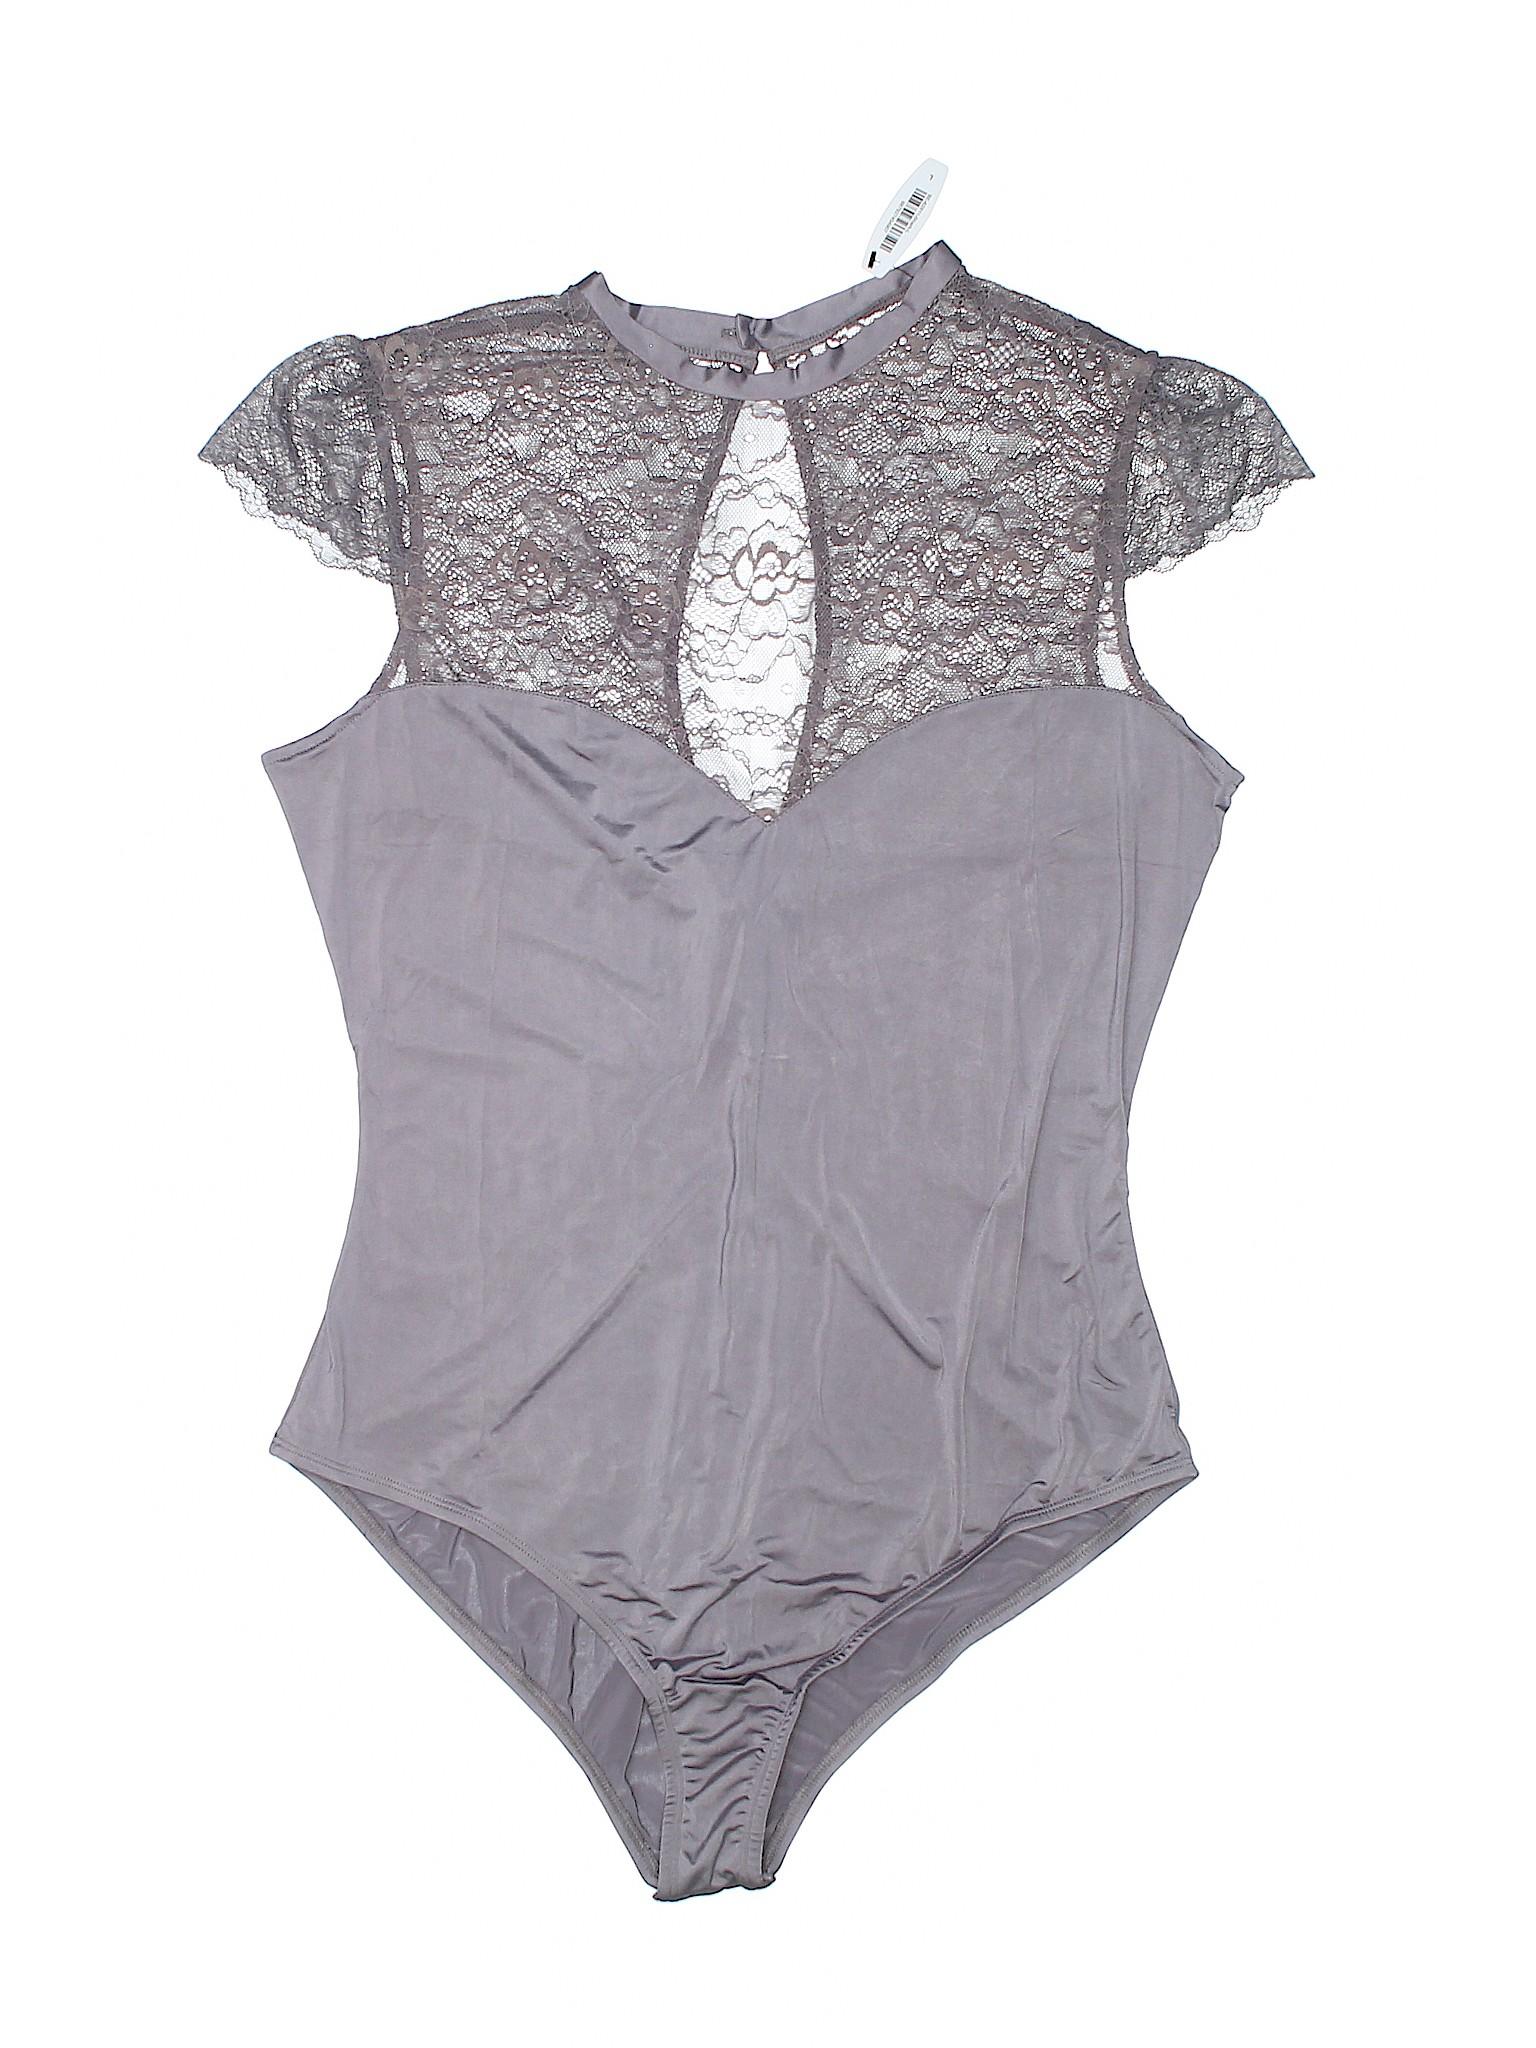 Boutique Swimsuit Adore Piece Me One XHqrnpvYq